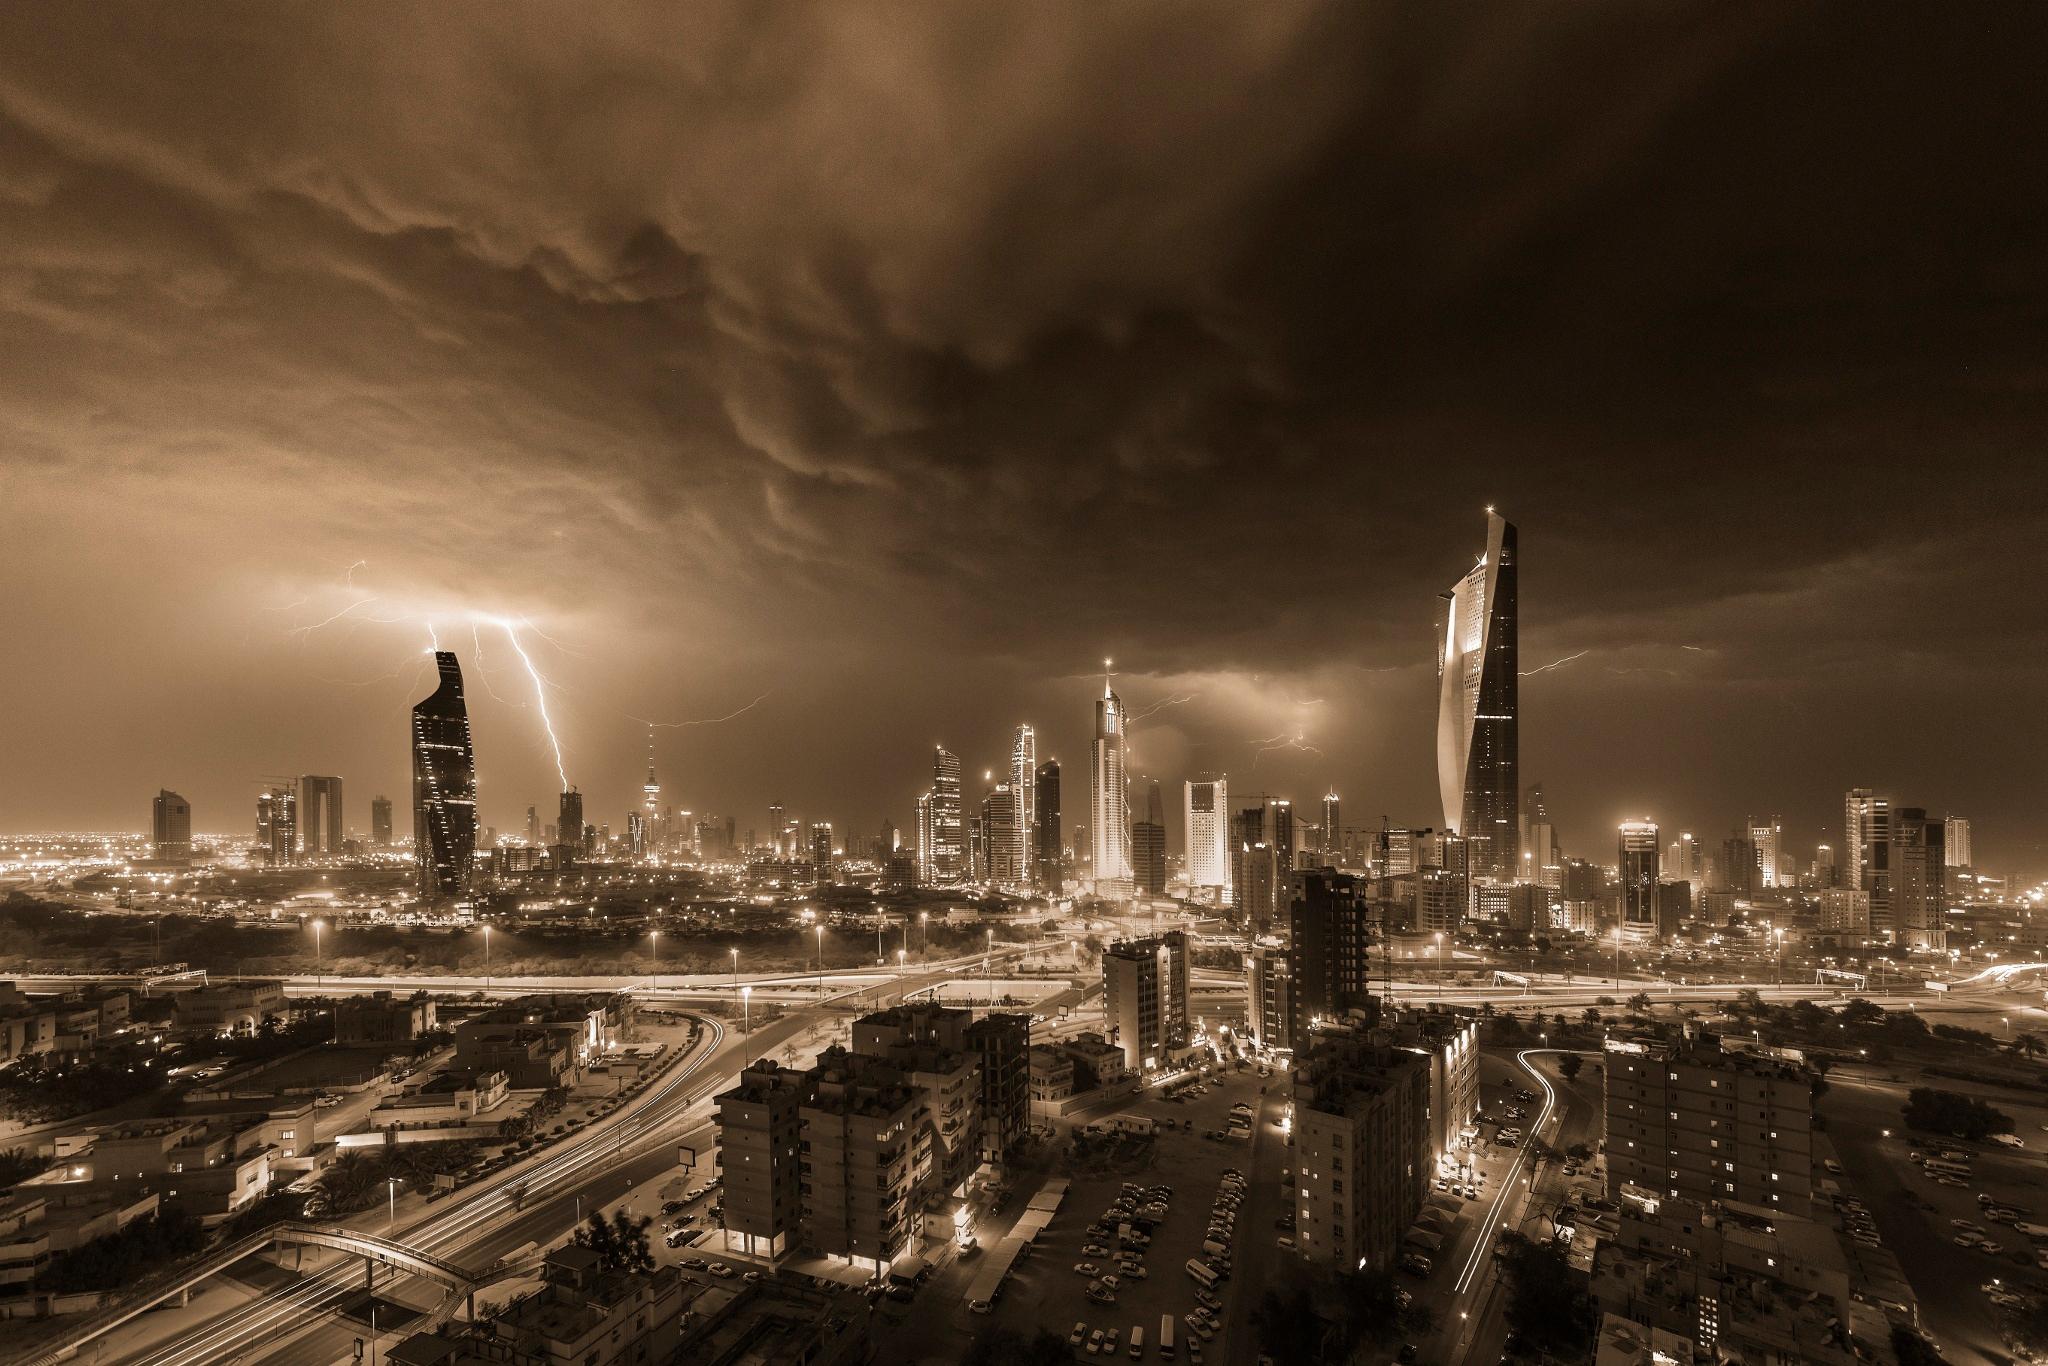 Kuwait Thunderstorm Sepia HD Wallpaper Background Image 2048x1366